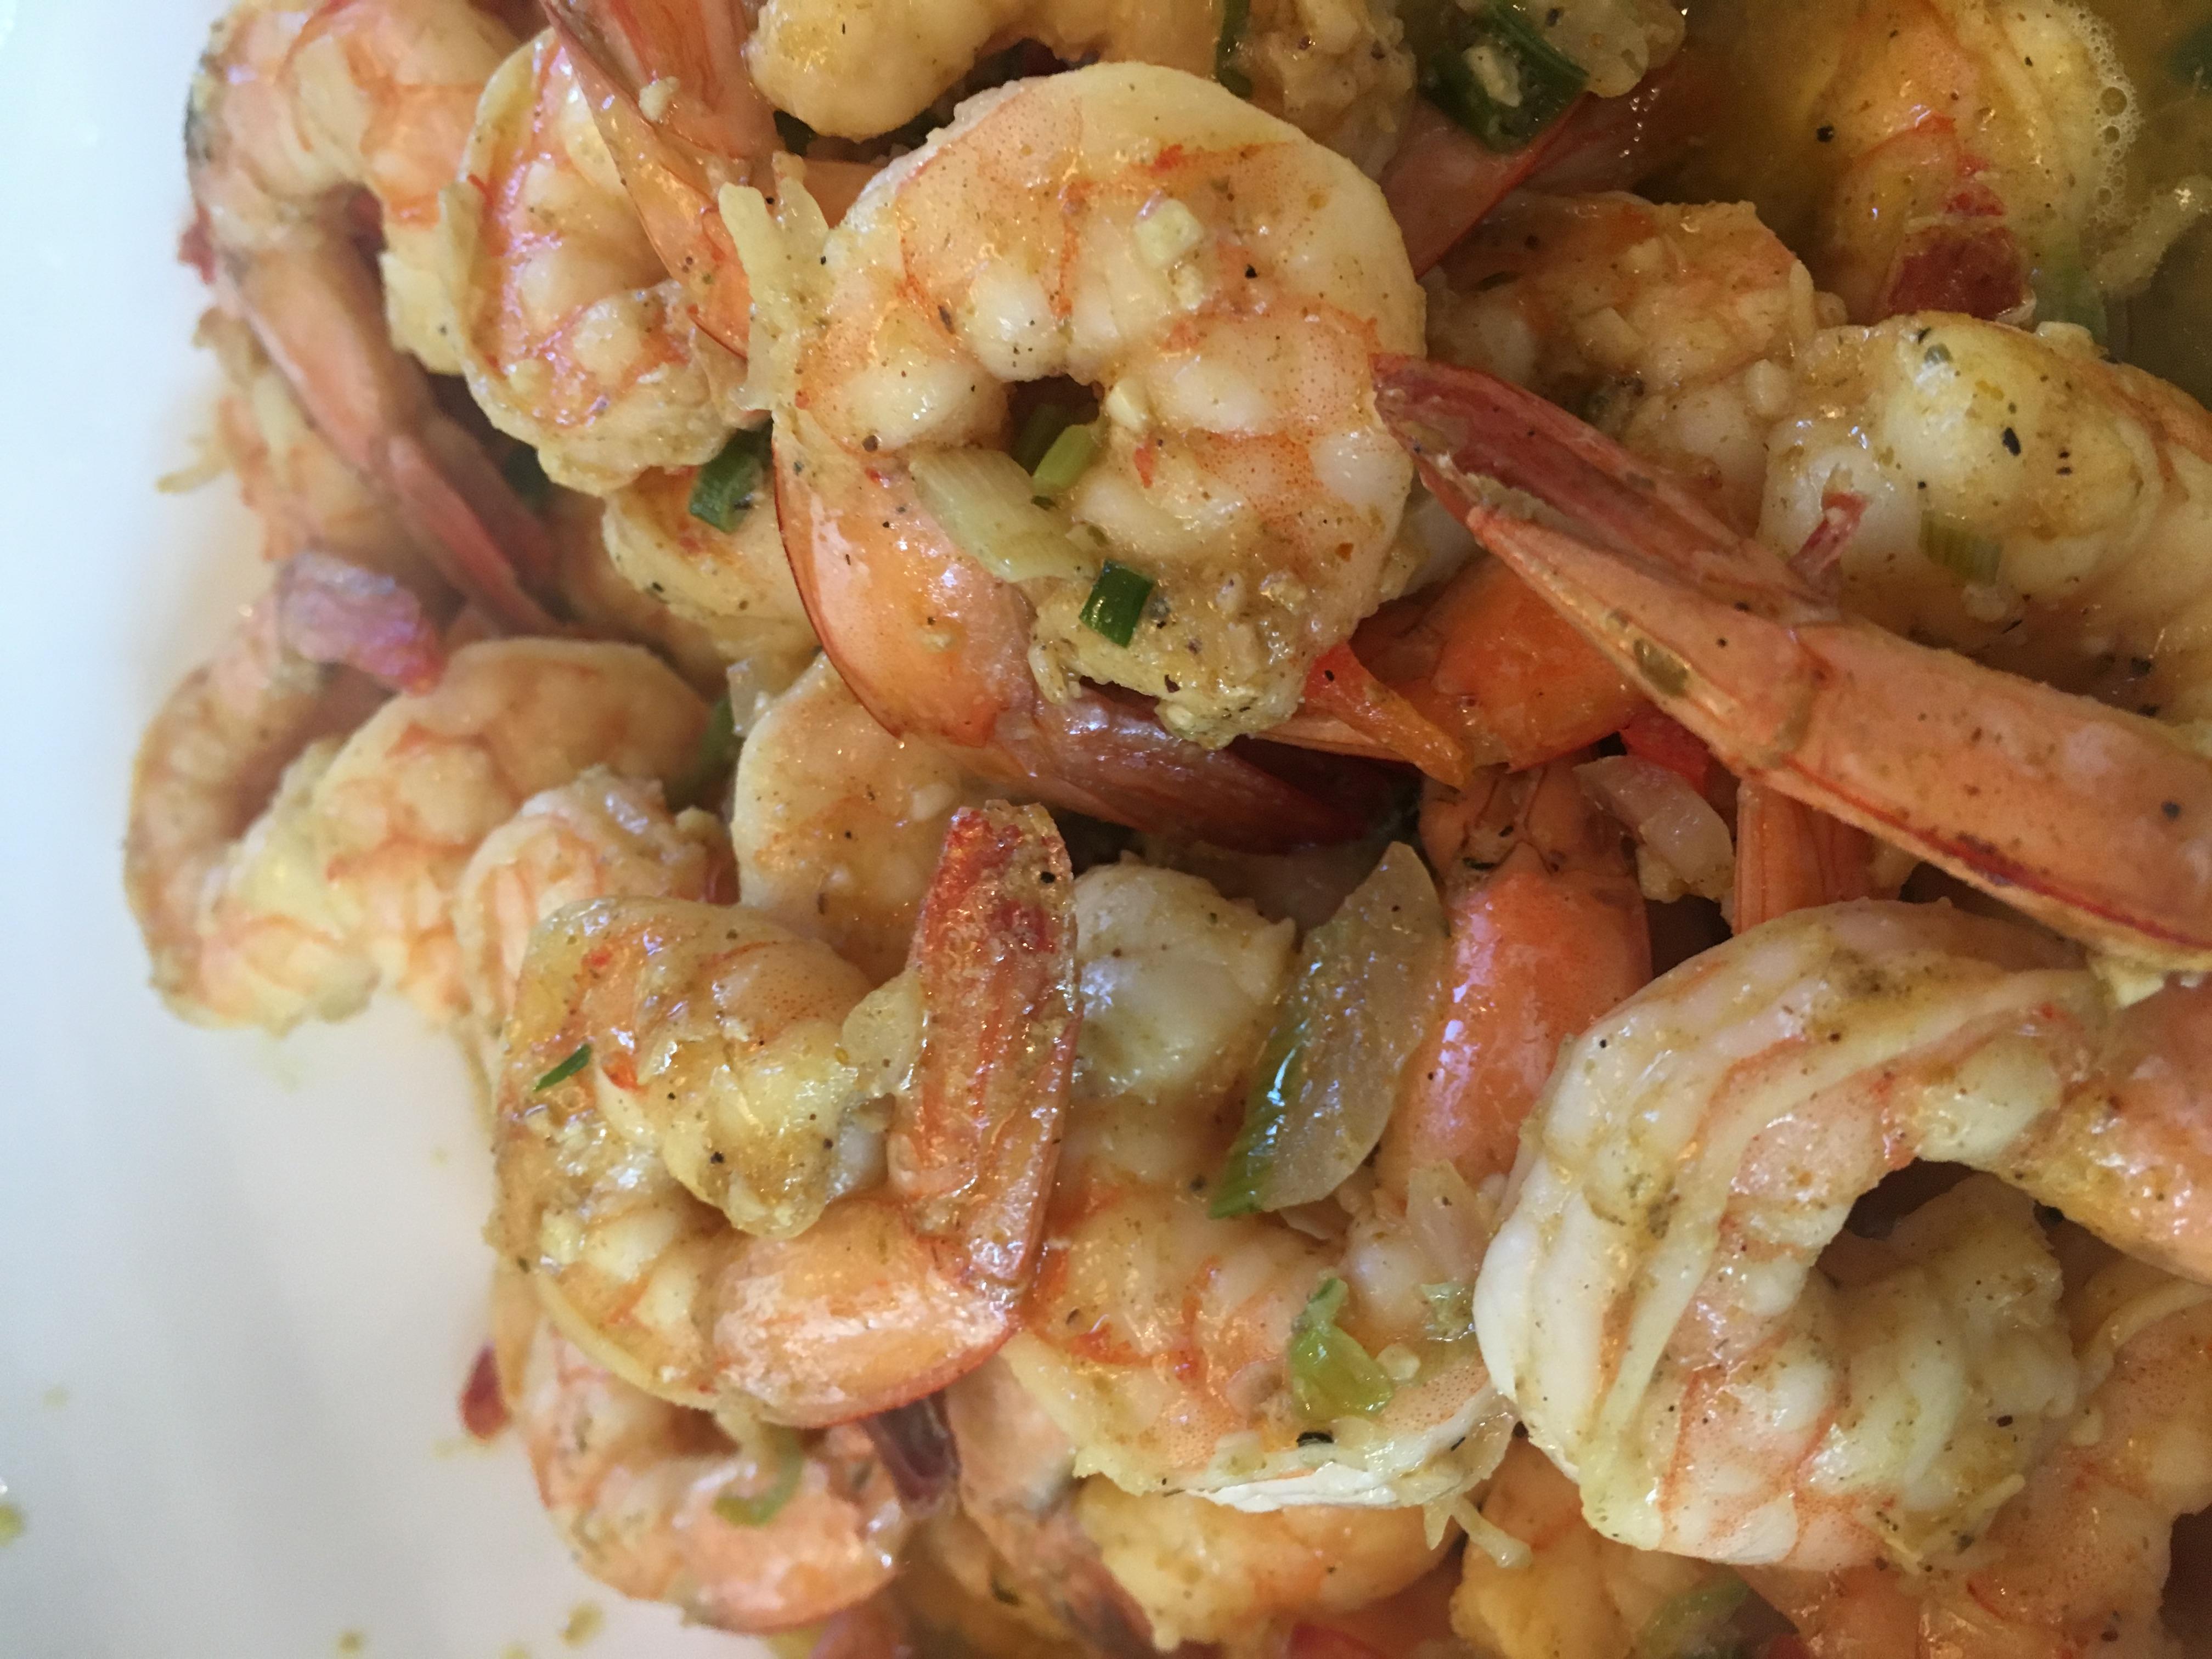 Southern Curry Garlic Chili Shrimp